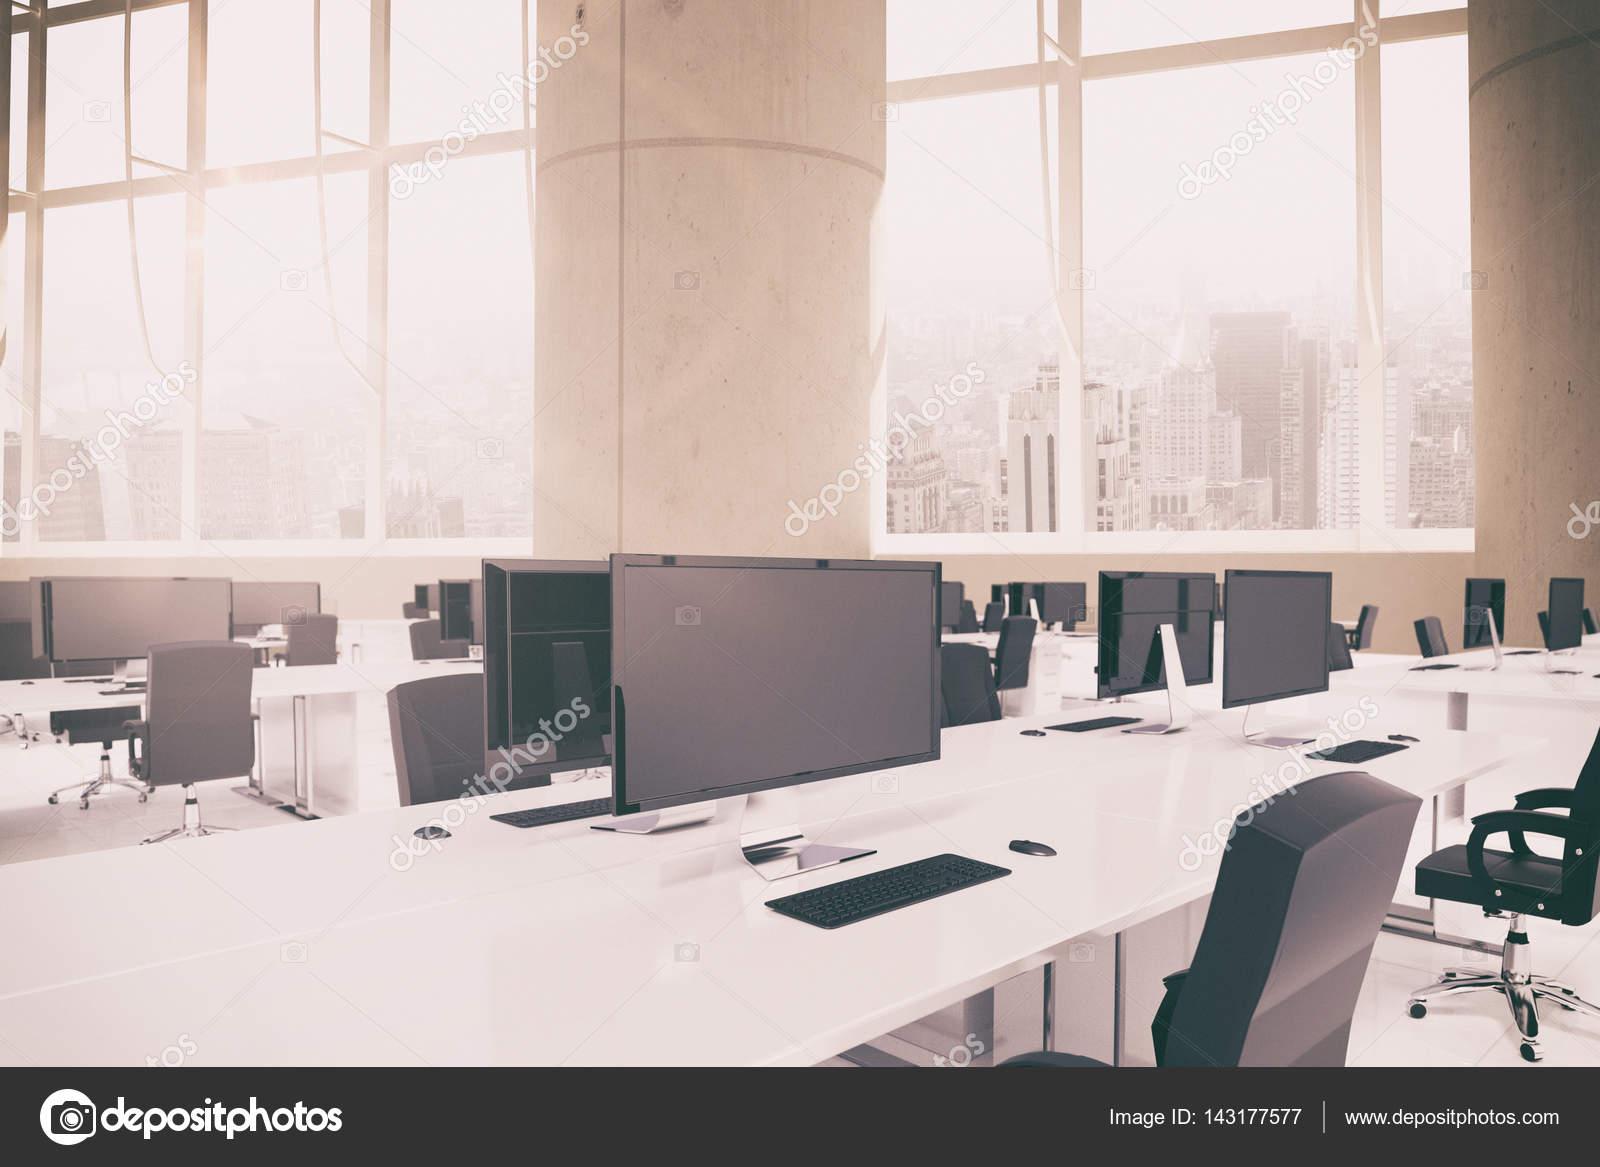 mobilier de bureau 3d contre windows photographie wavebreakmedia 143177577. Black Bedroom Furniture Sets. Home Design Ideas